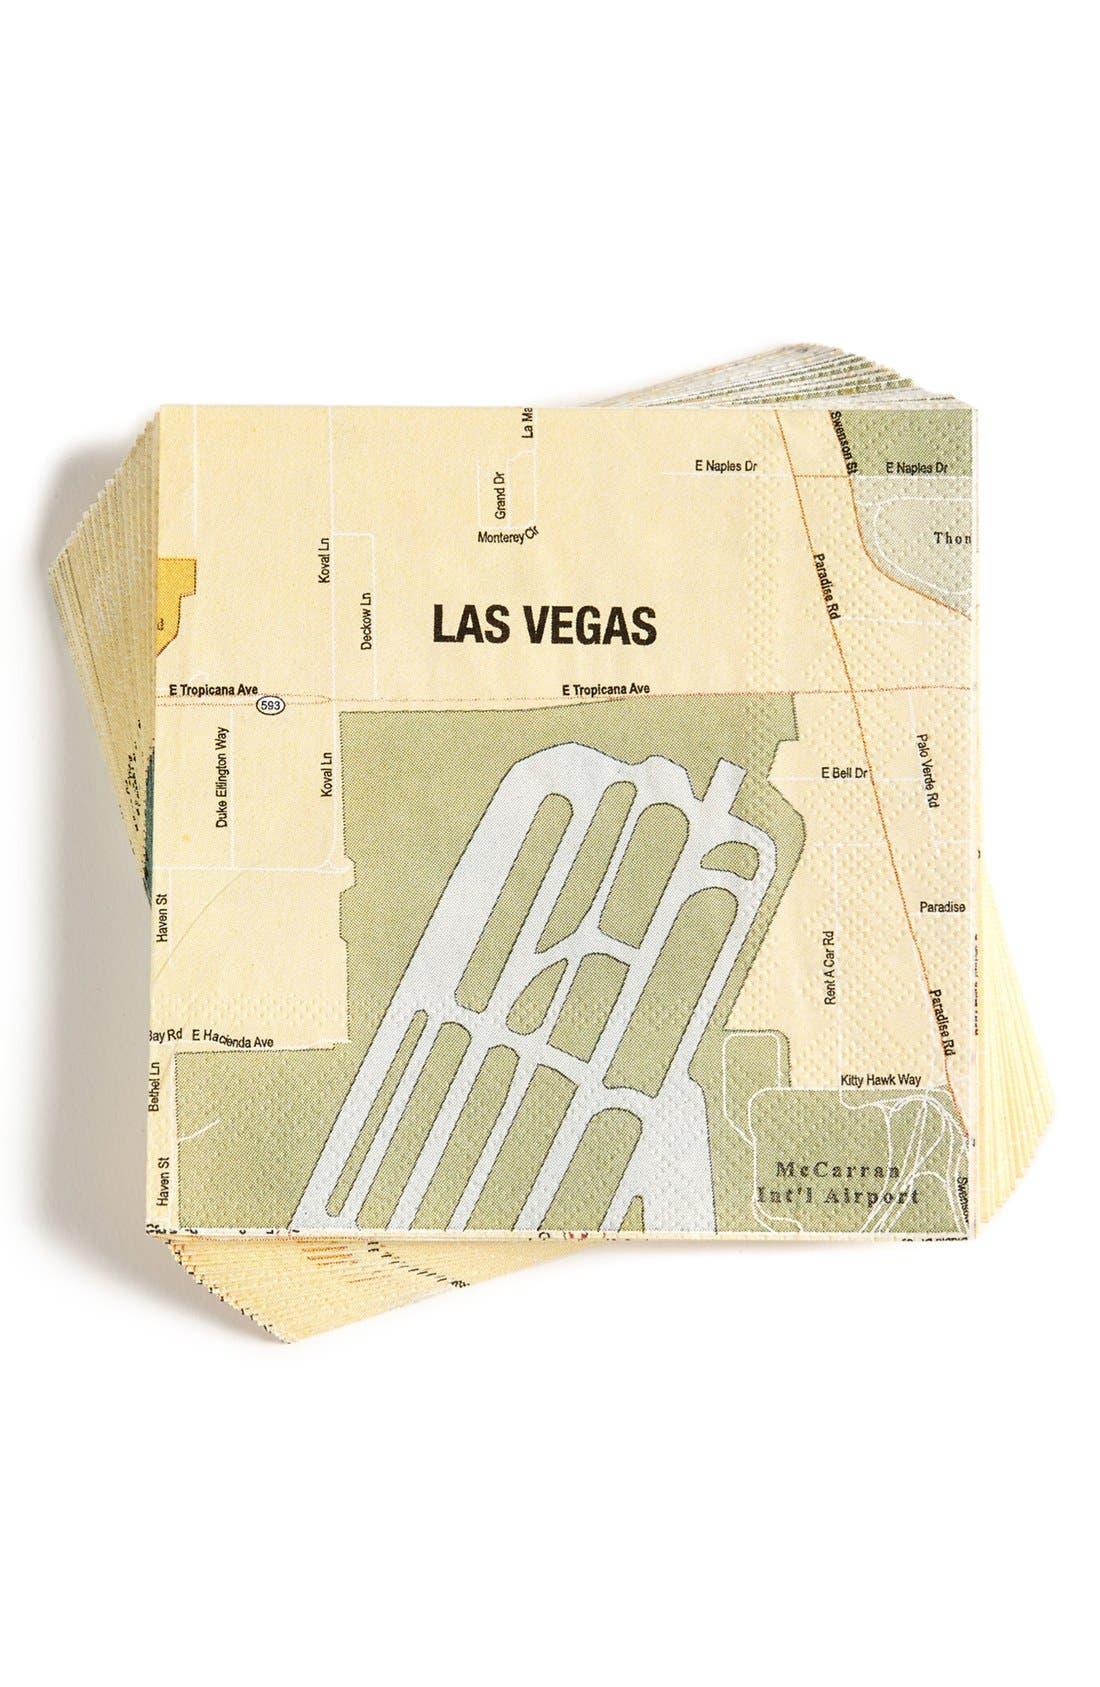 Alternate Image 1 Selected - Design Ideas 'Las Vegas Mapkins' Cocktail Napkins